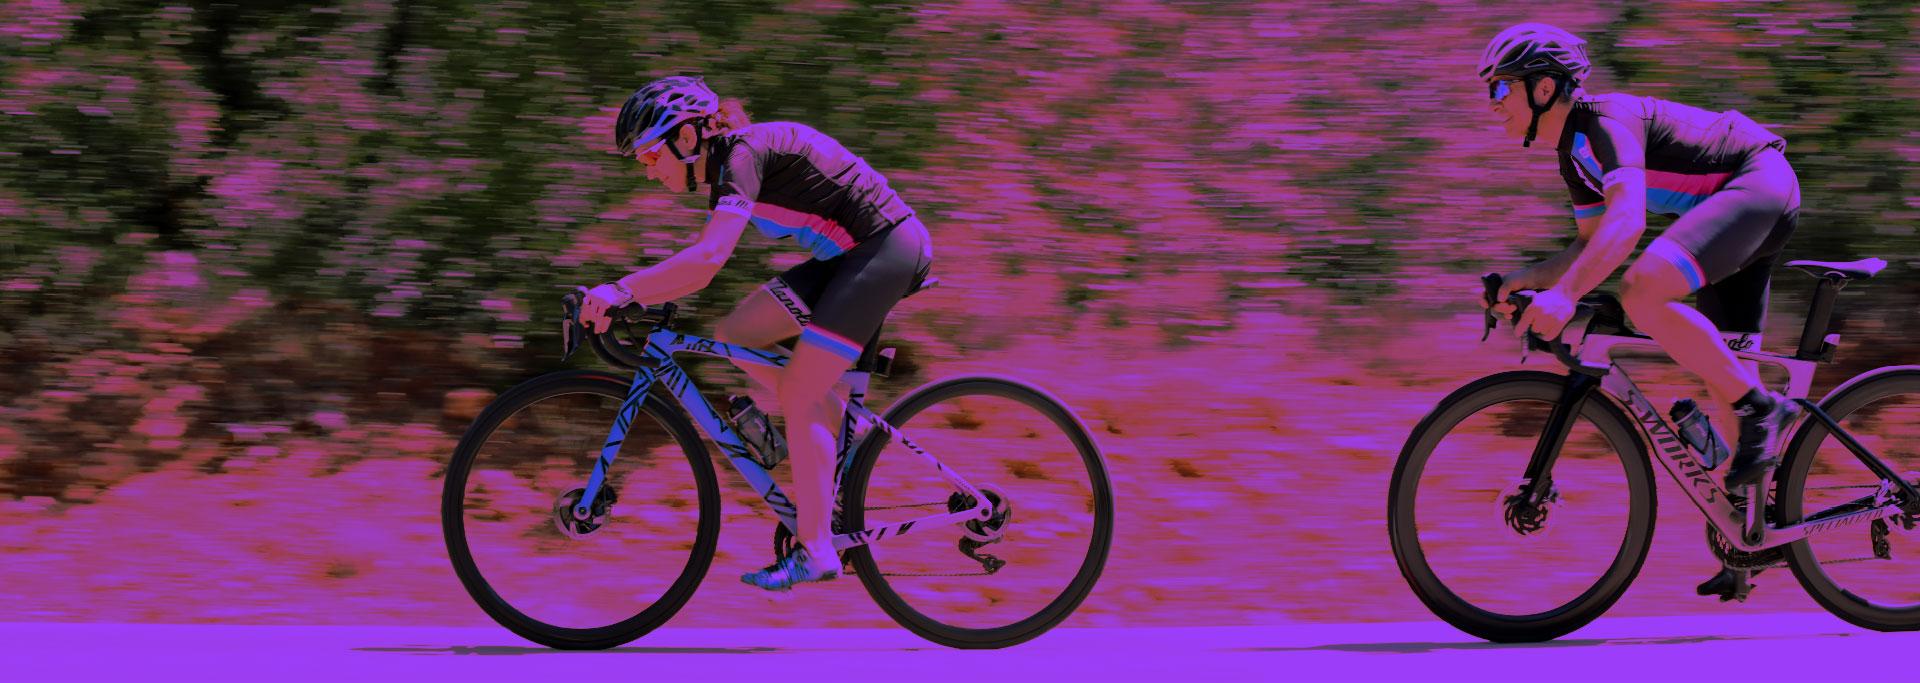 Bicicletas Cyclope